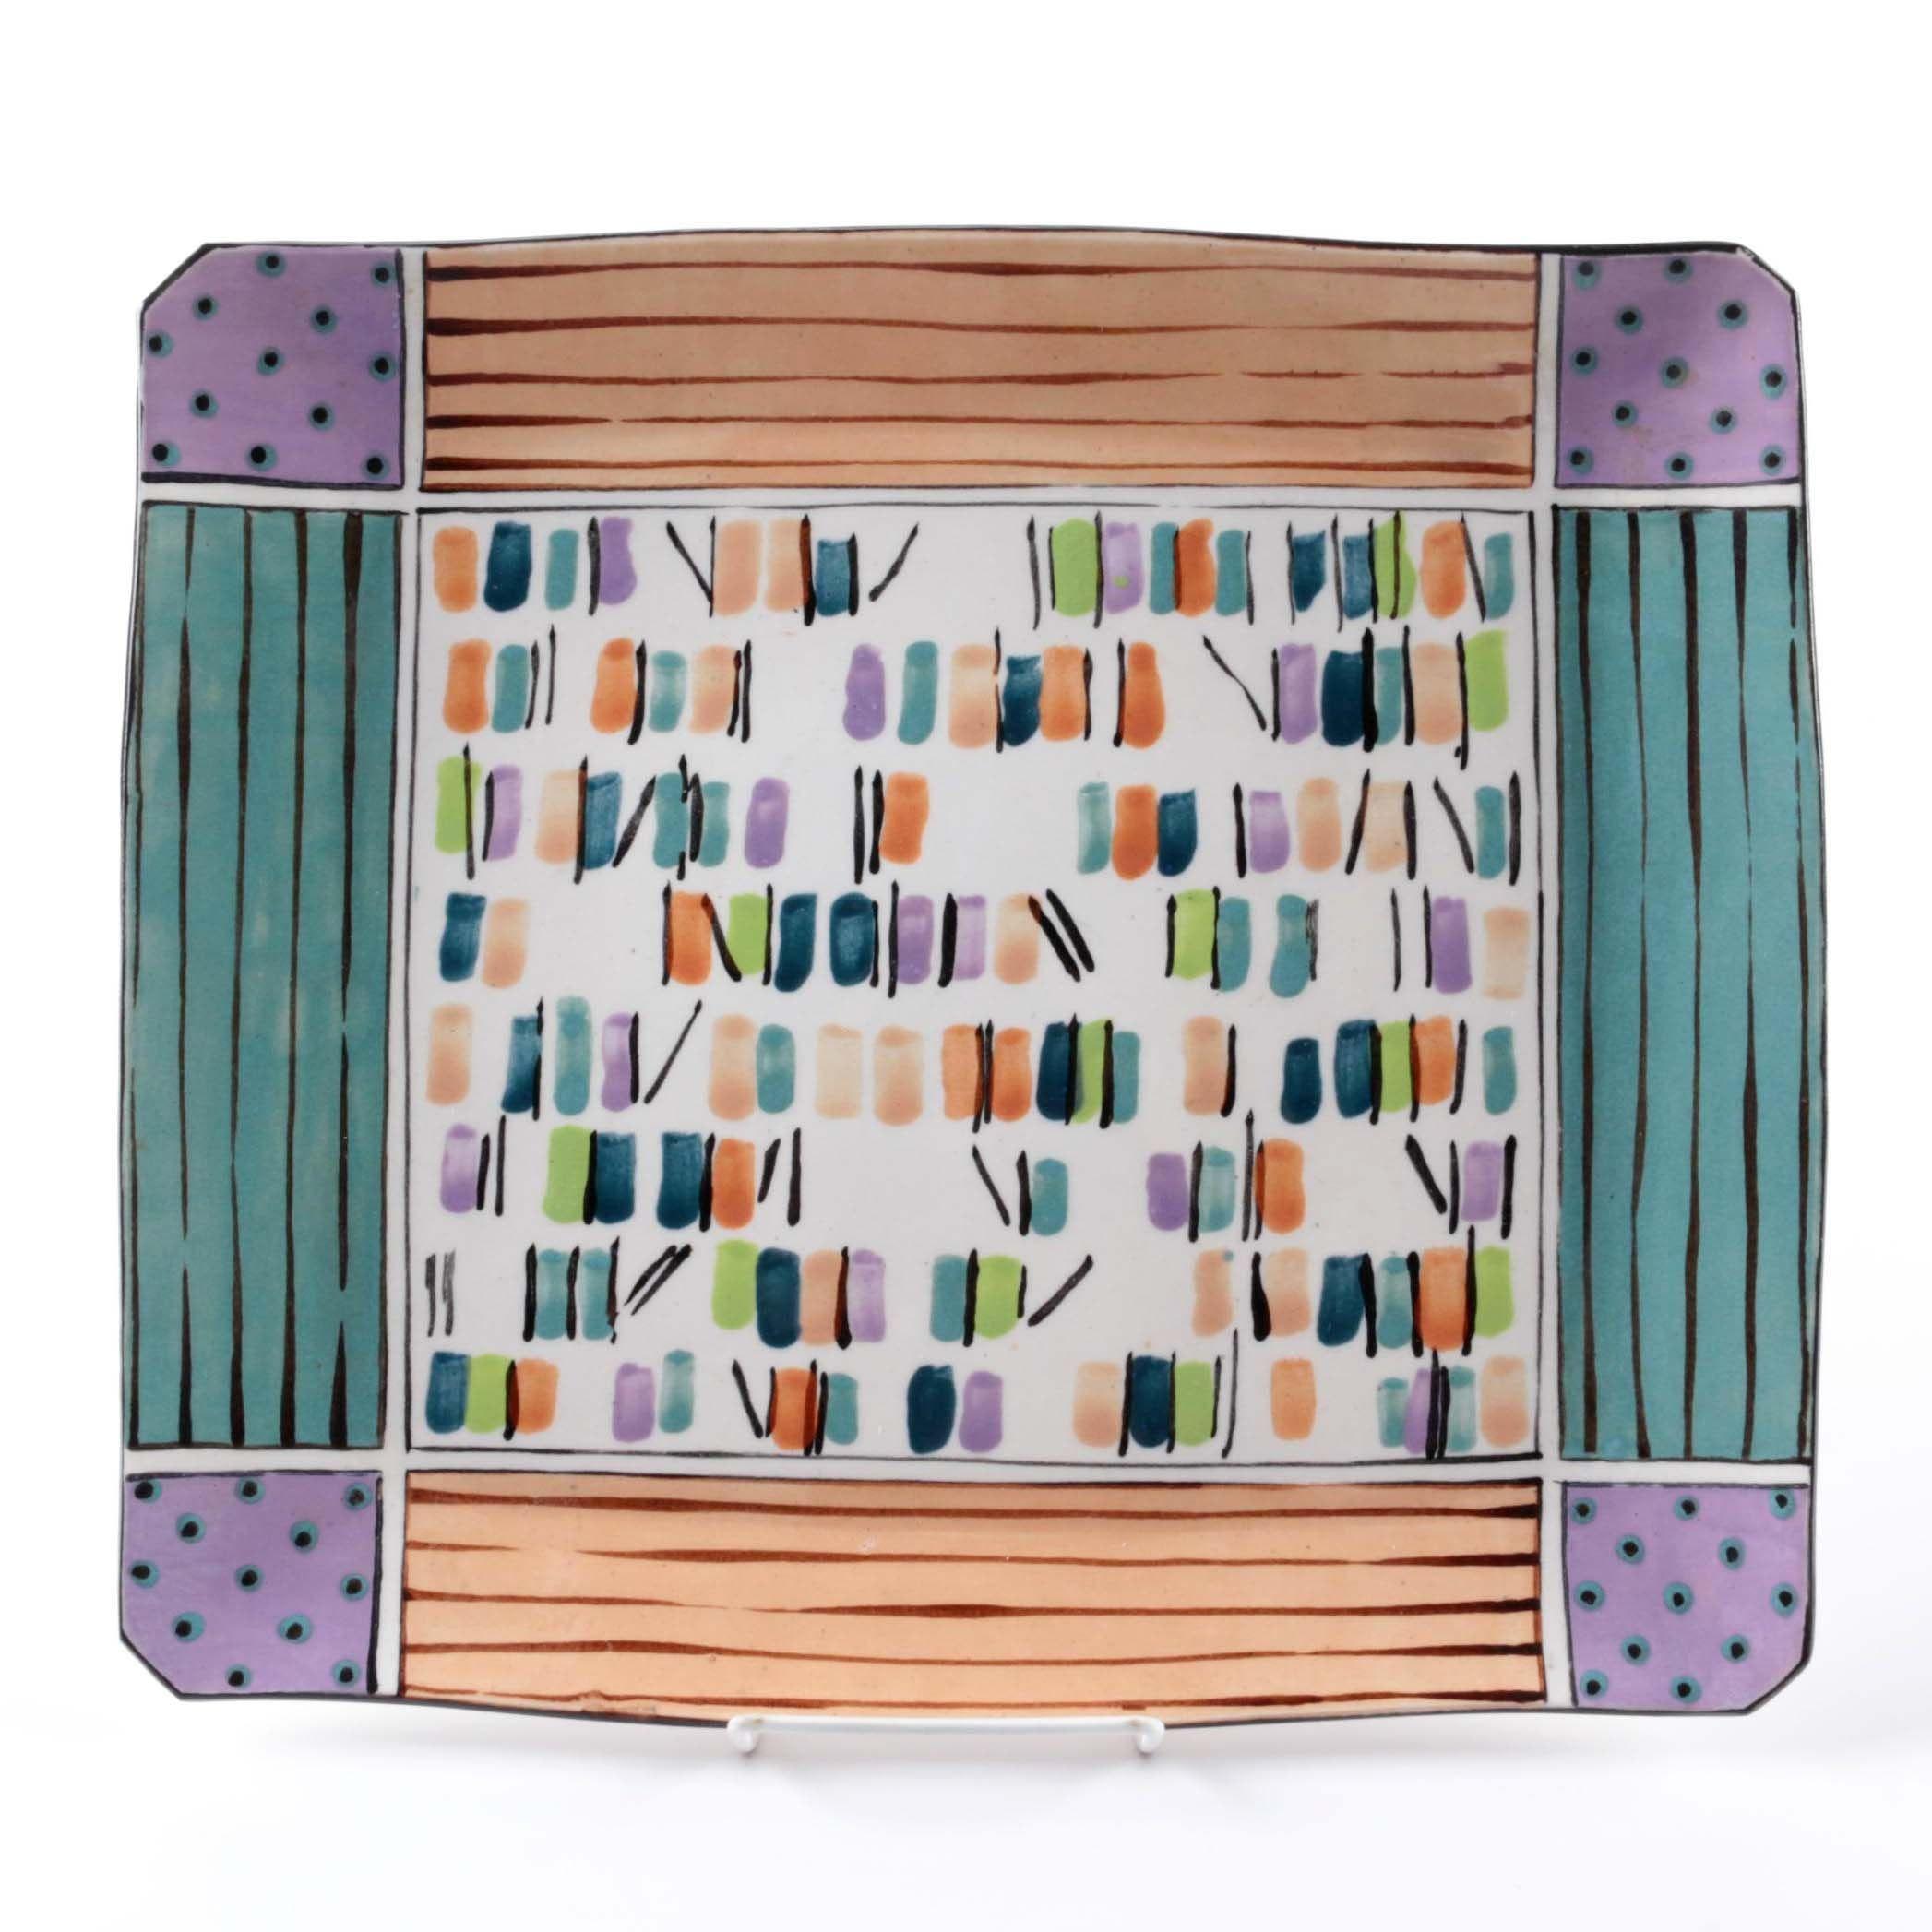 Dorothy Hafner Hand-Painted Porcelain Platter